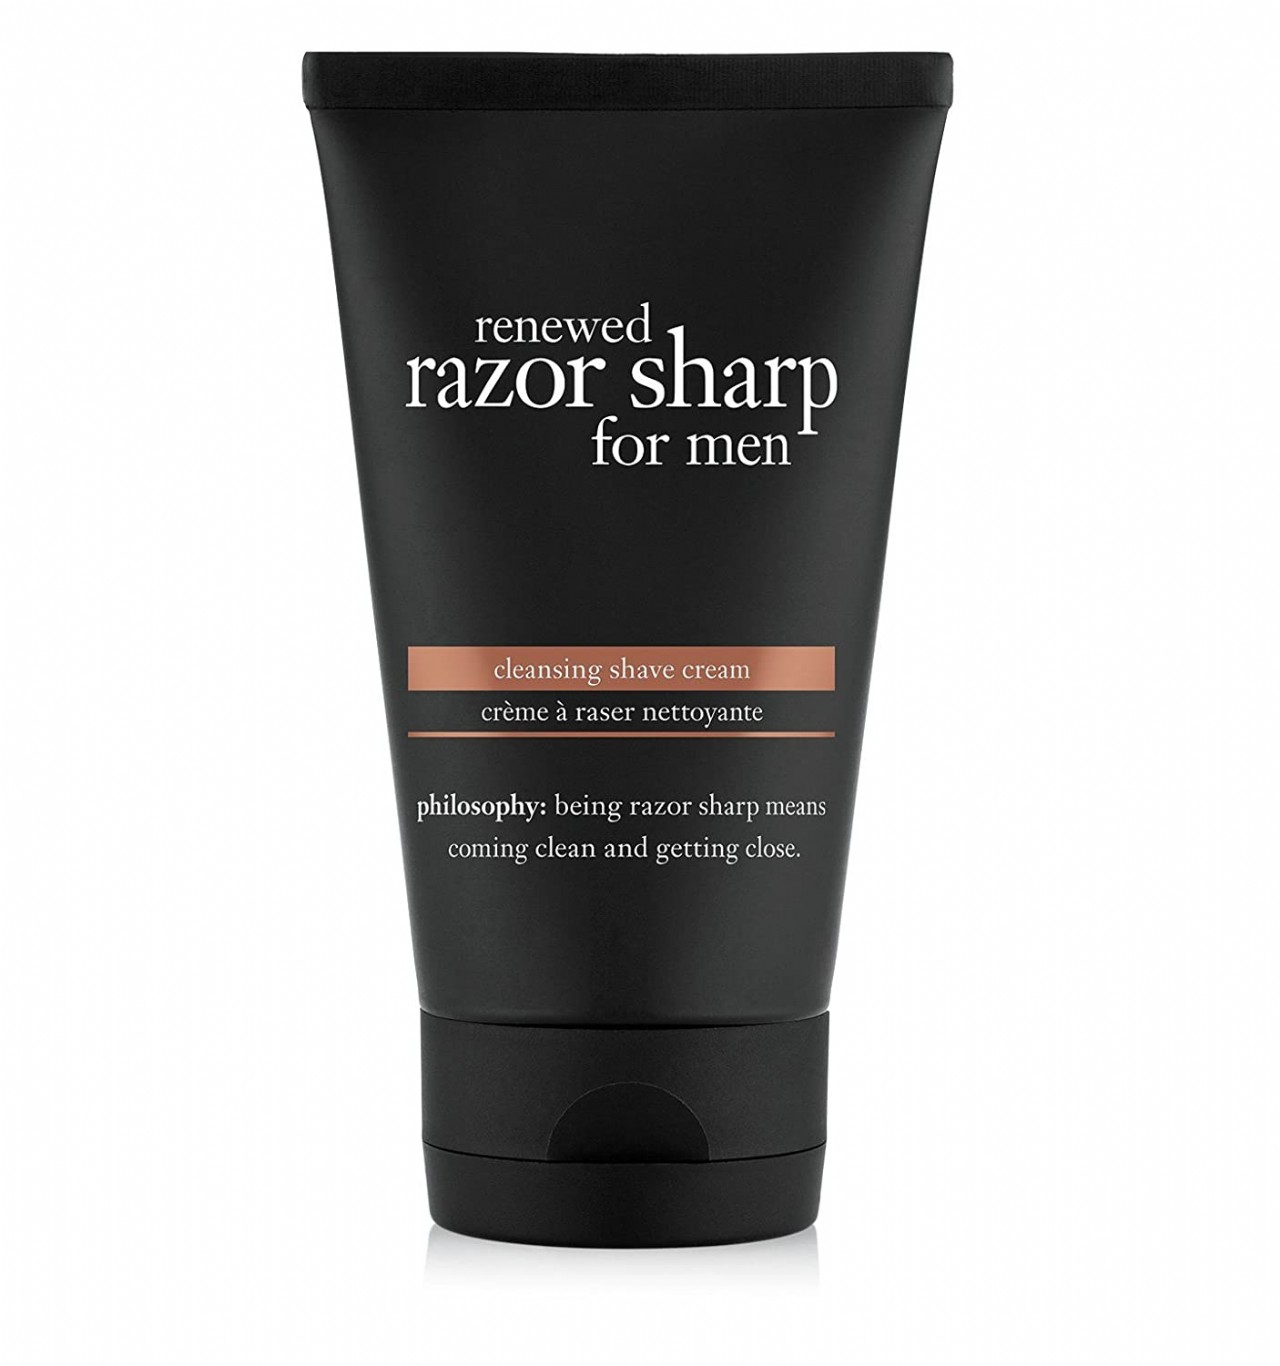 philosophy renewed razor sharp for men cleansing shave cream, 5 Fl Oz